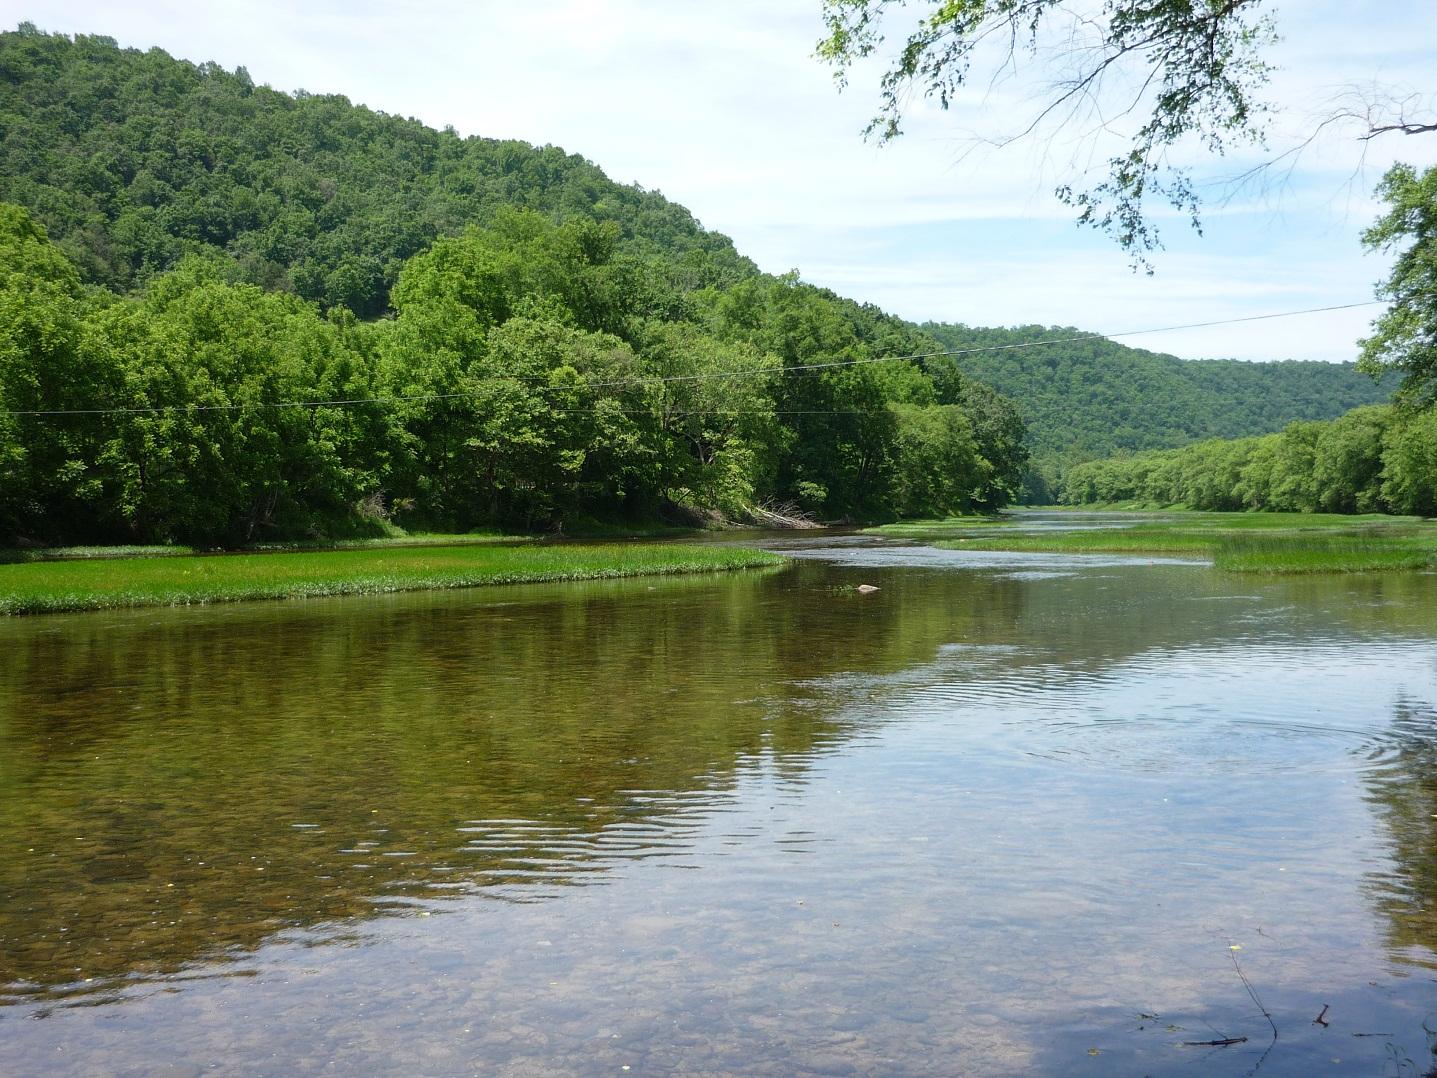 greenbriar river trail west virginia